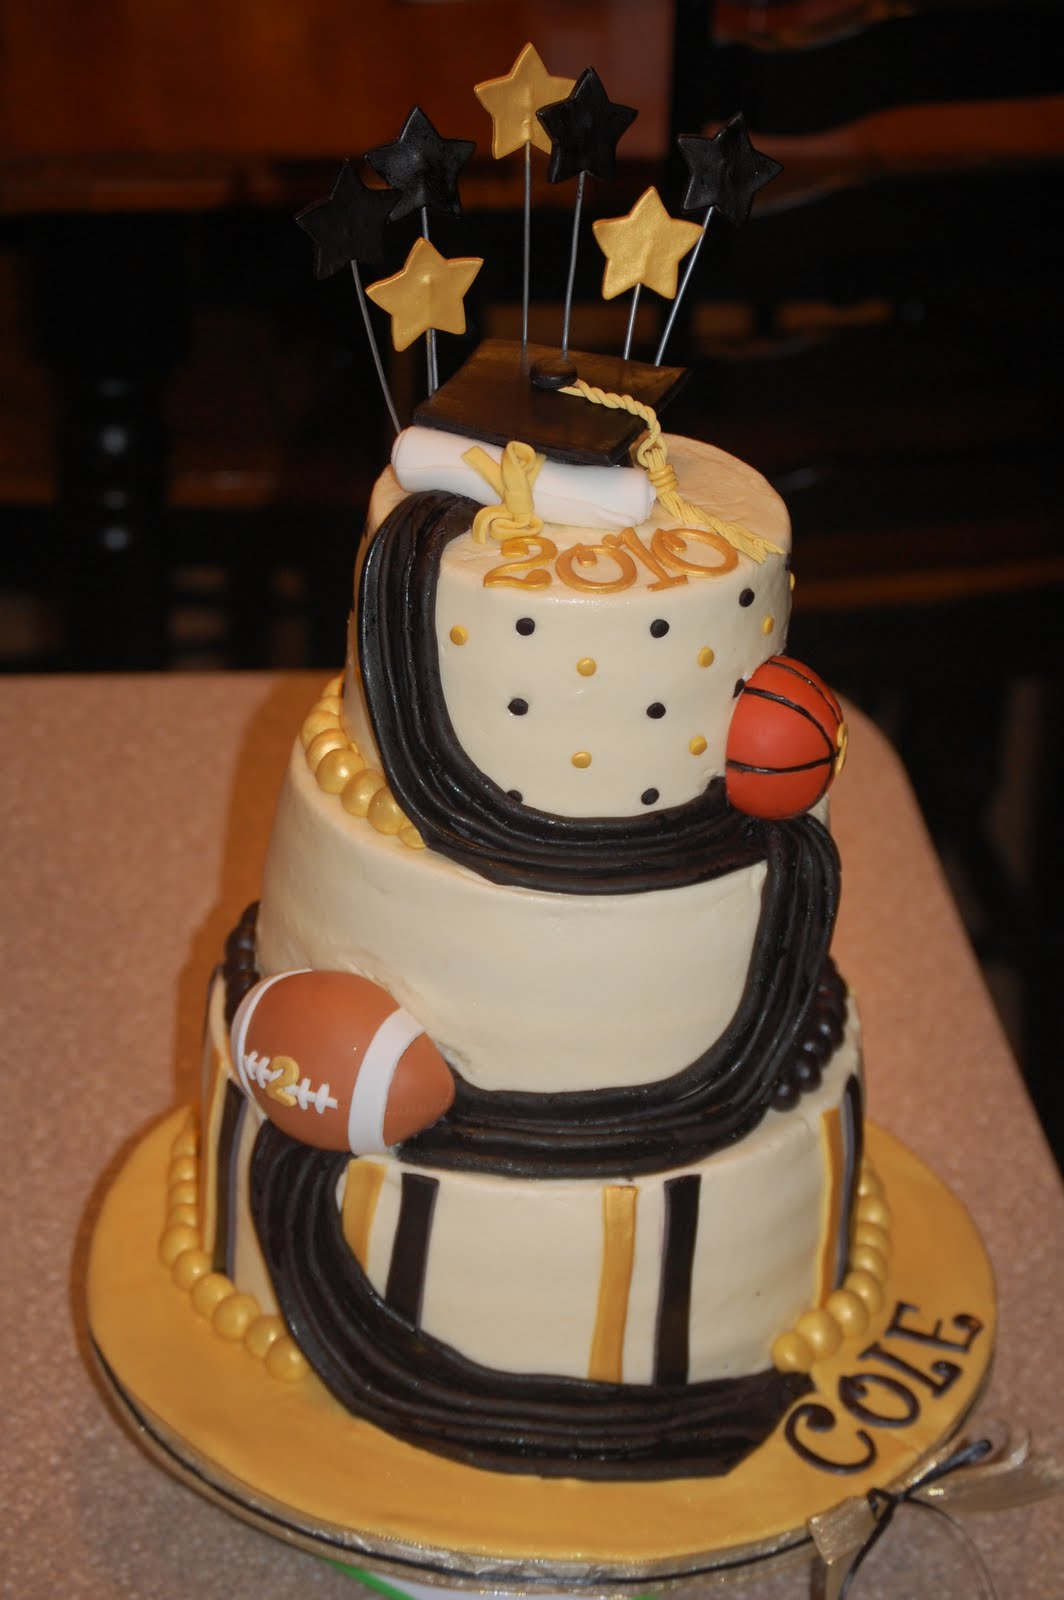 Cake Decorations At Coles : A Piece of Cake!: Cole s Graduation Cake